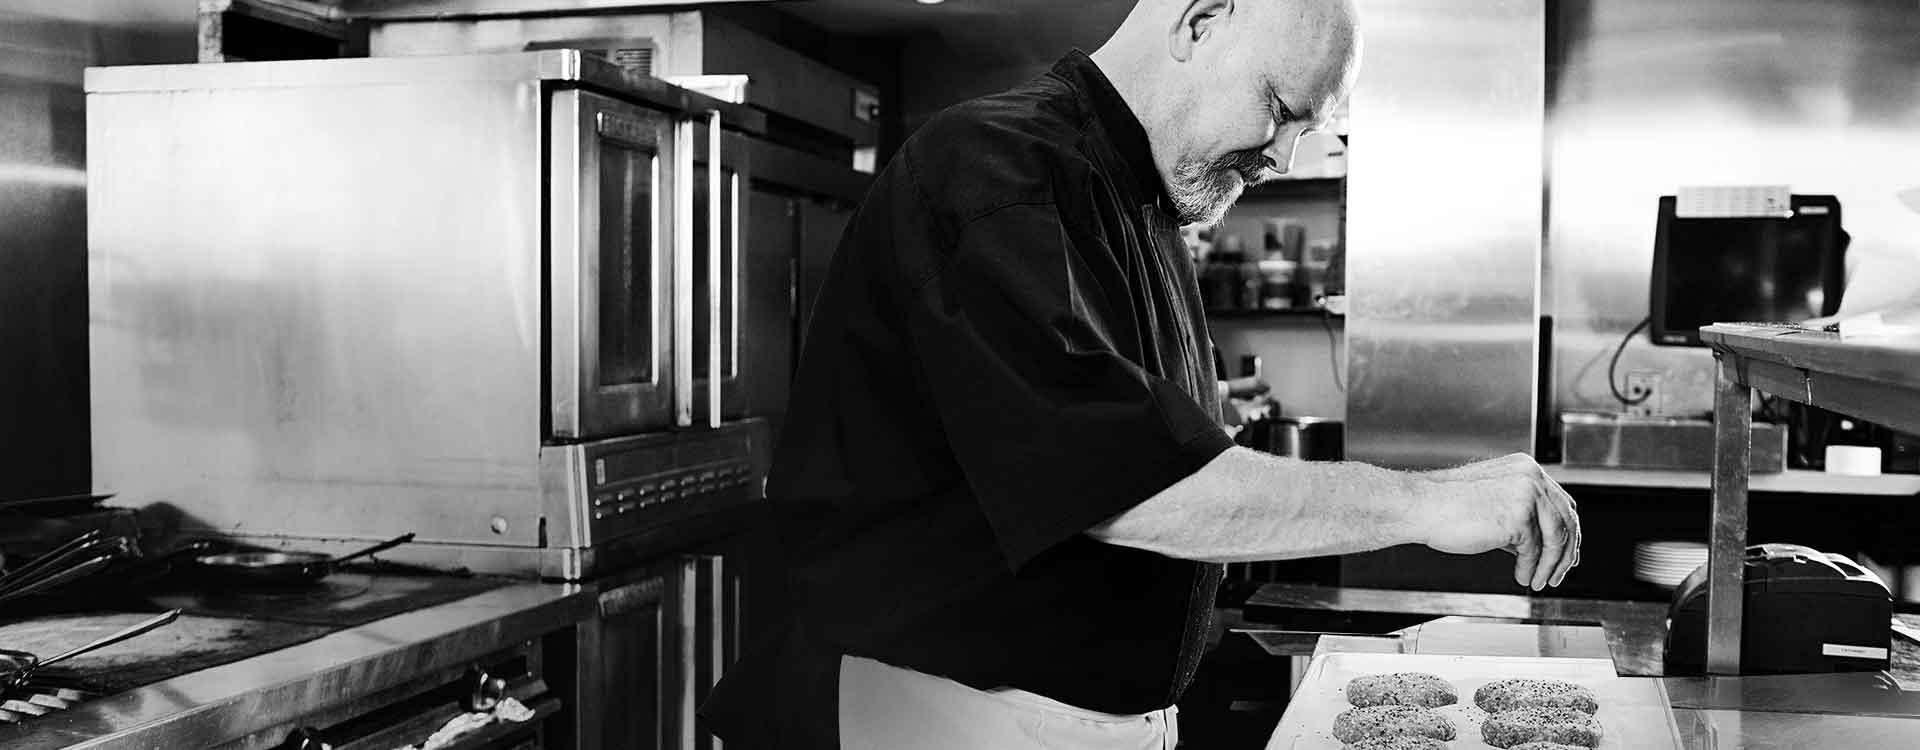 Chef Pete Geoghegan